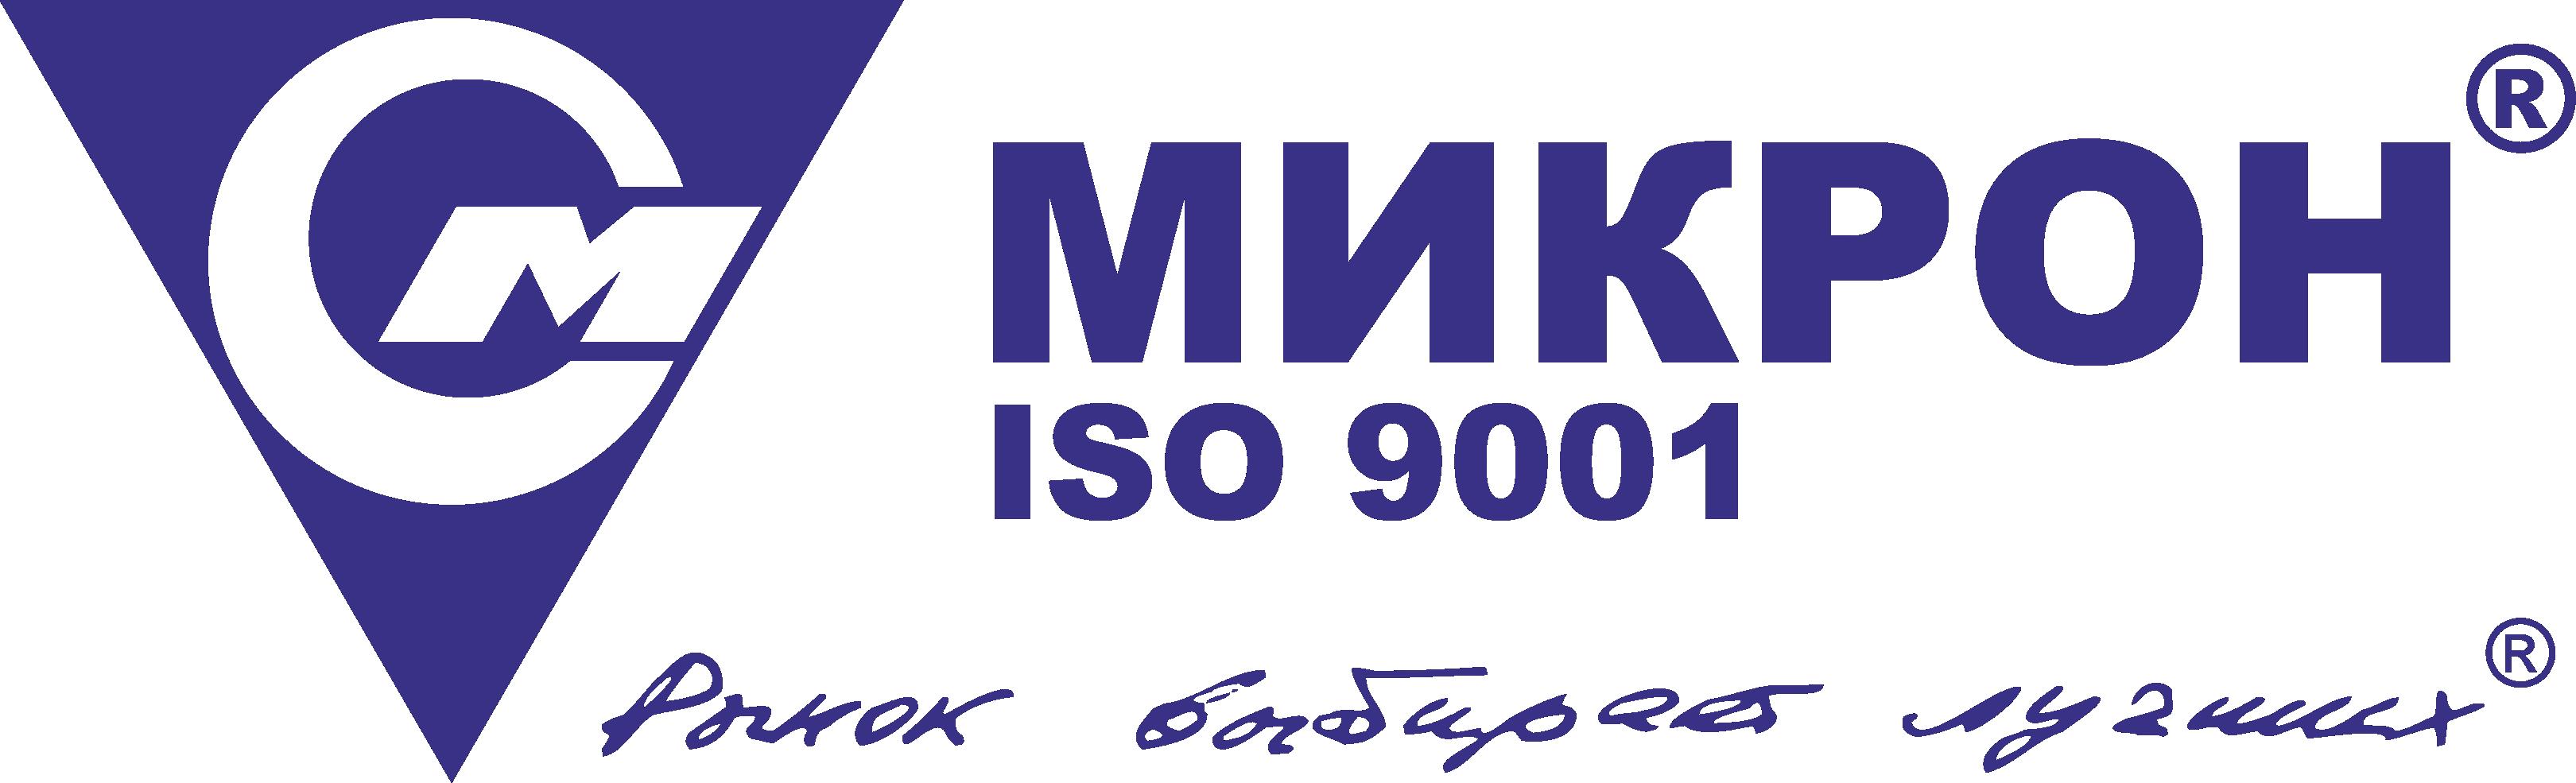 logo-ru micron